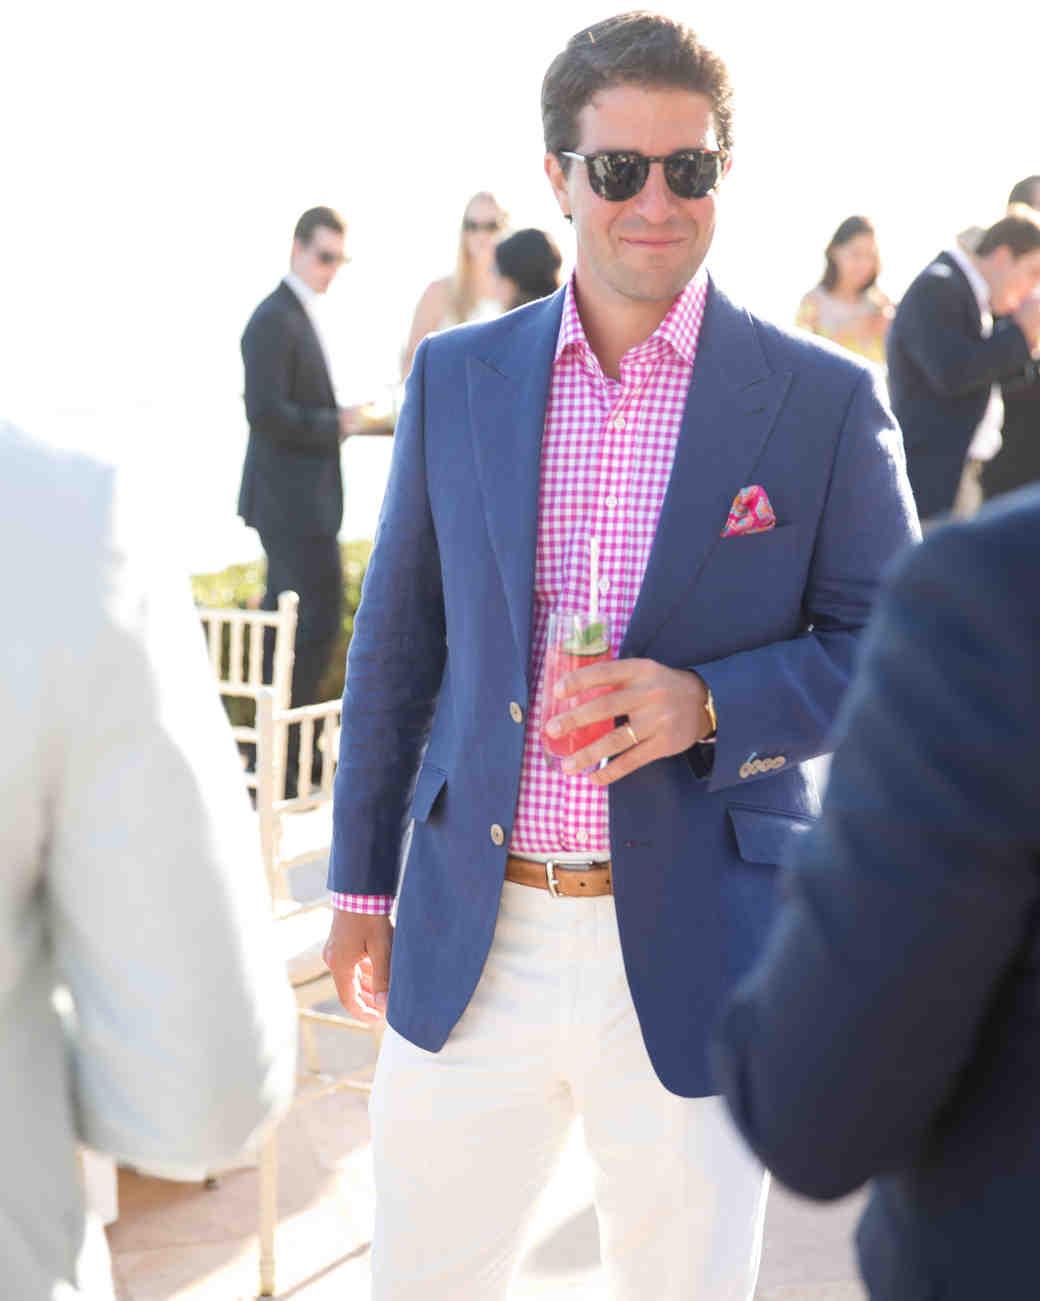 tiffany david california wedding 0067 s112348 vert - mens beach wedding attire ideas